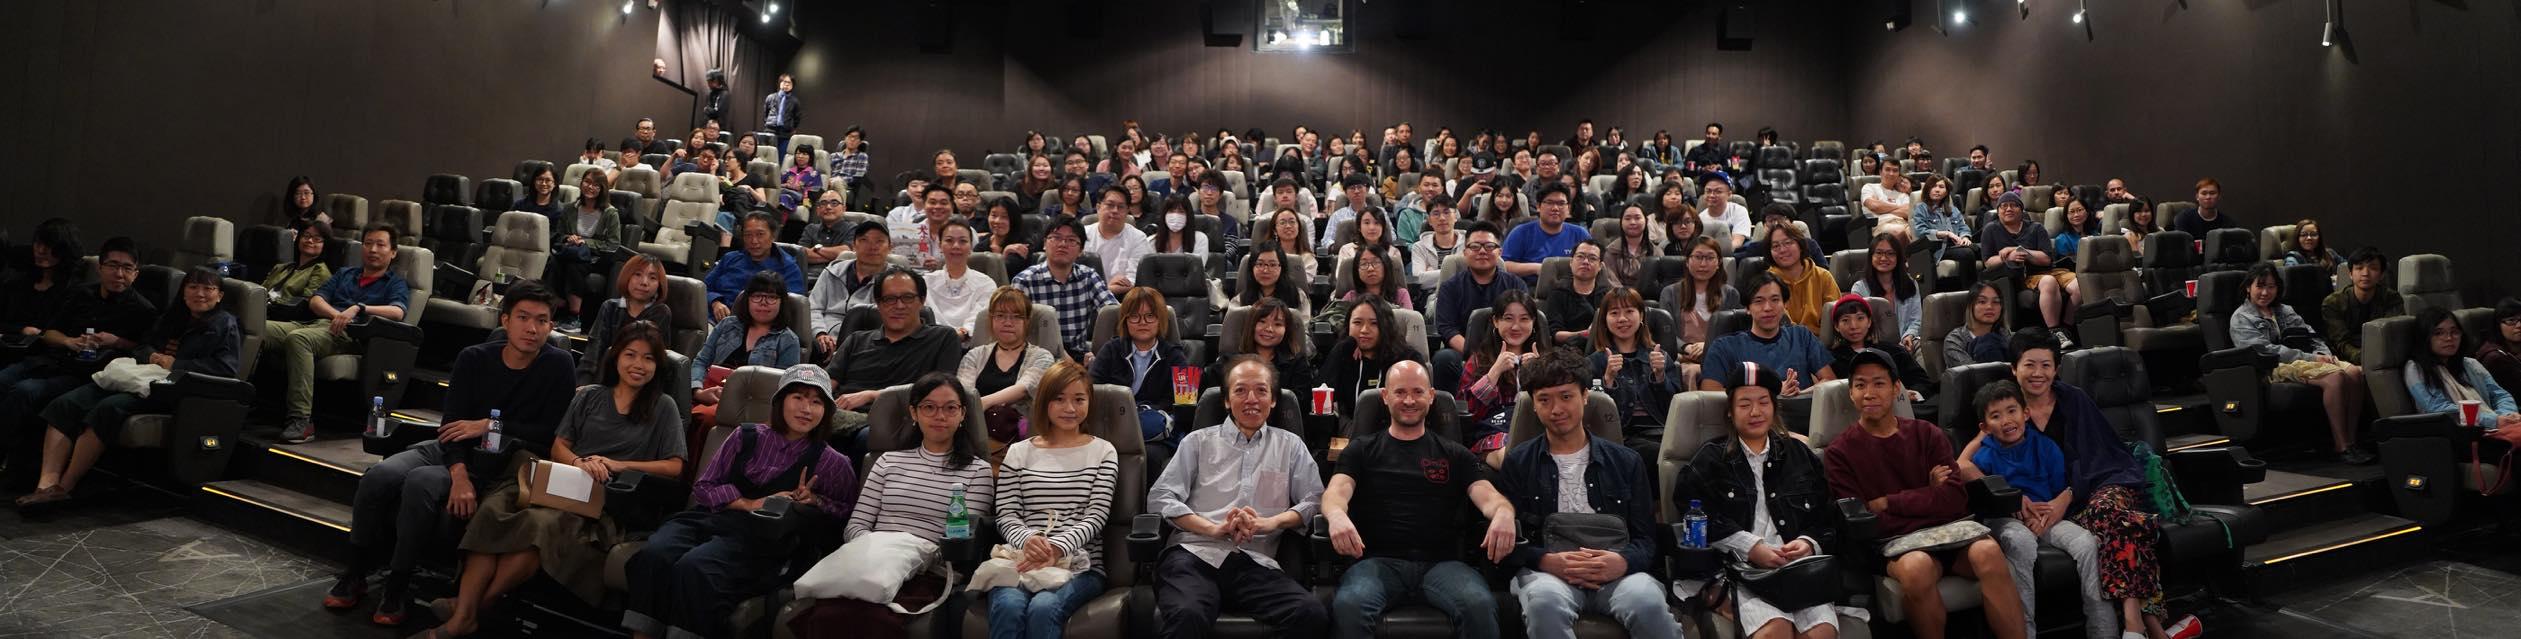 UA Cinehub Stop motion animation masterclass 2